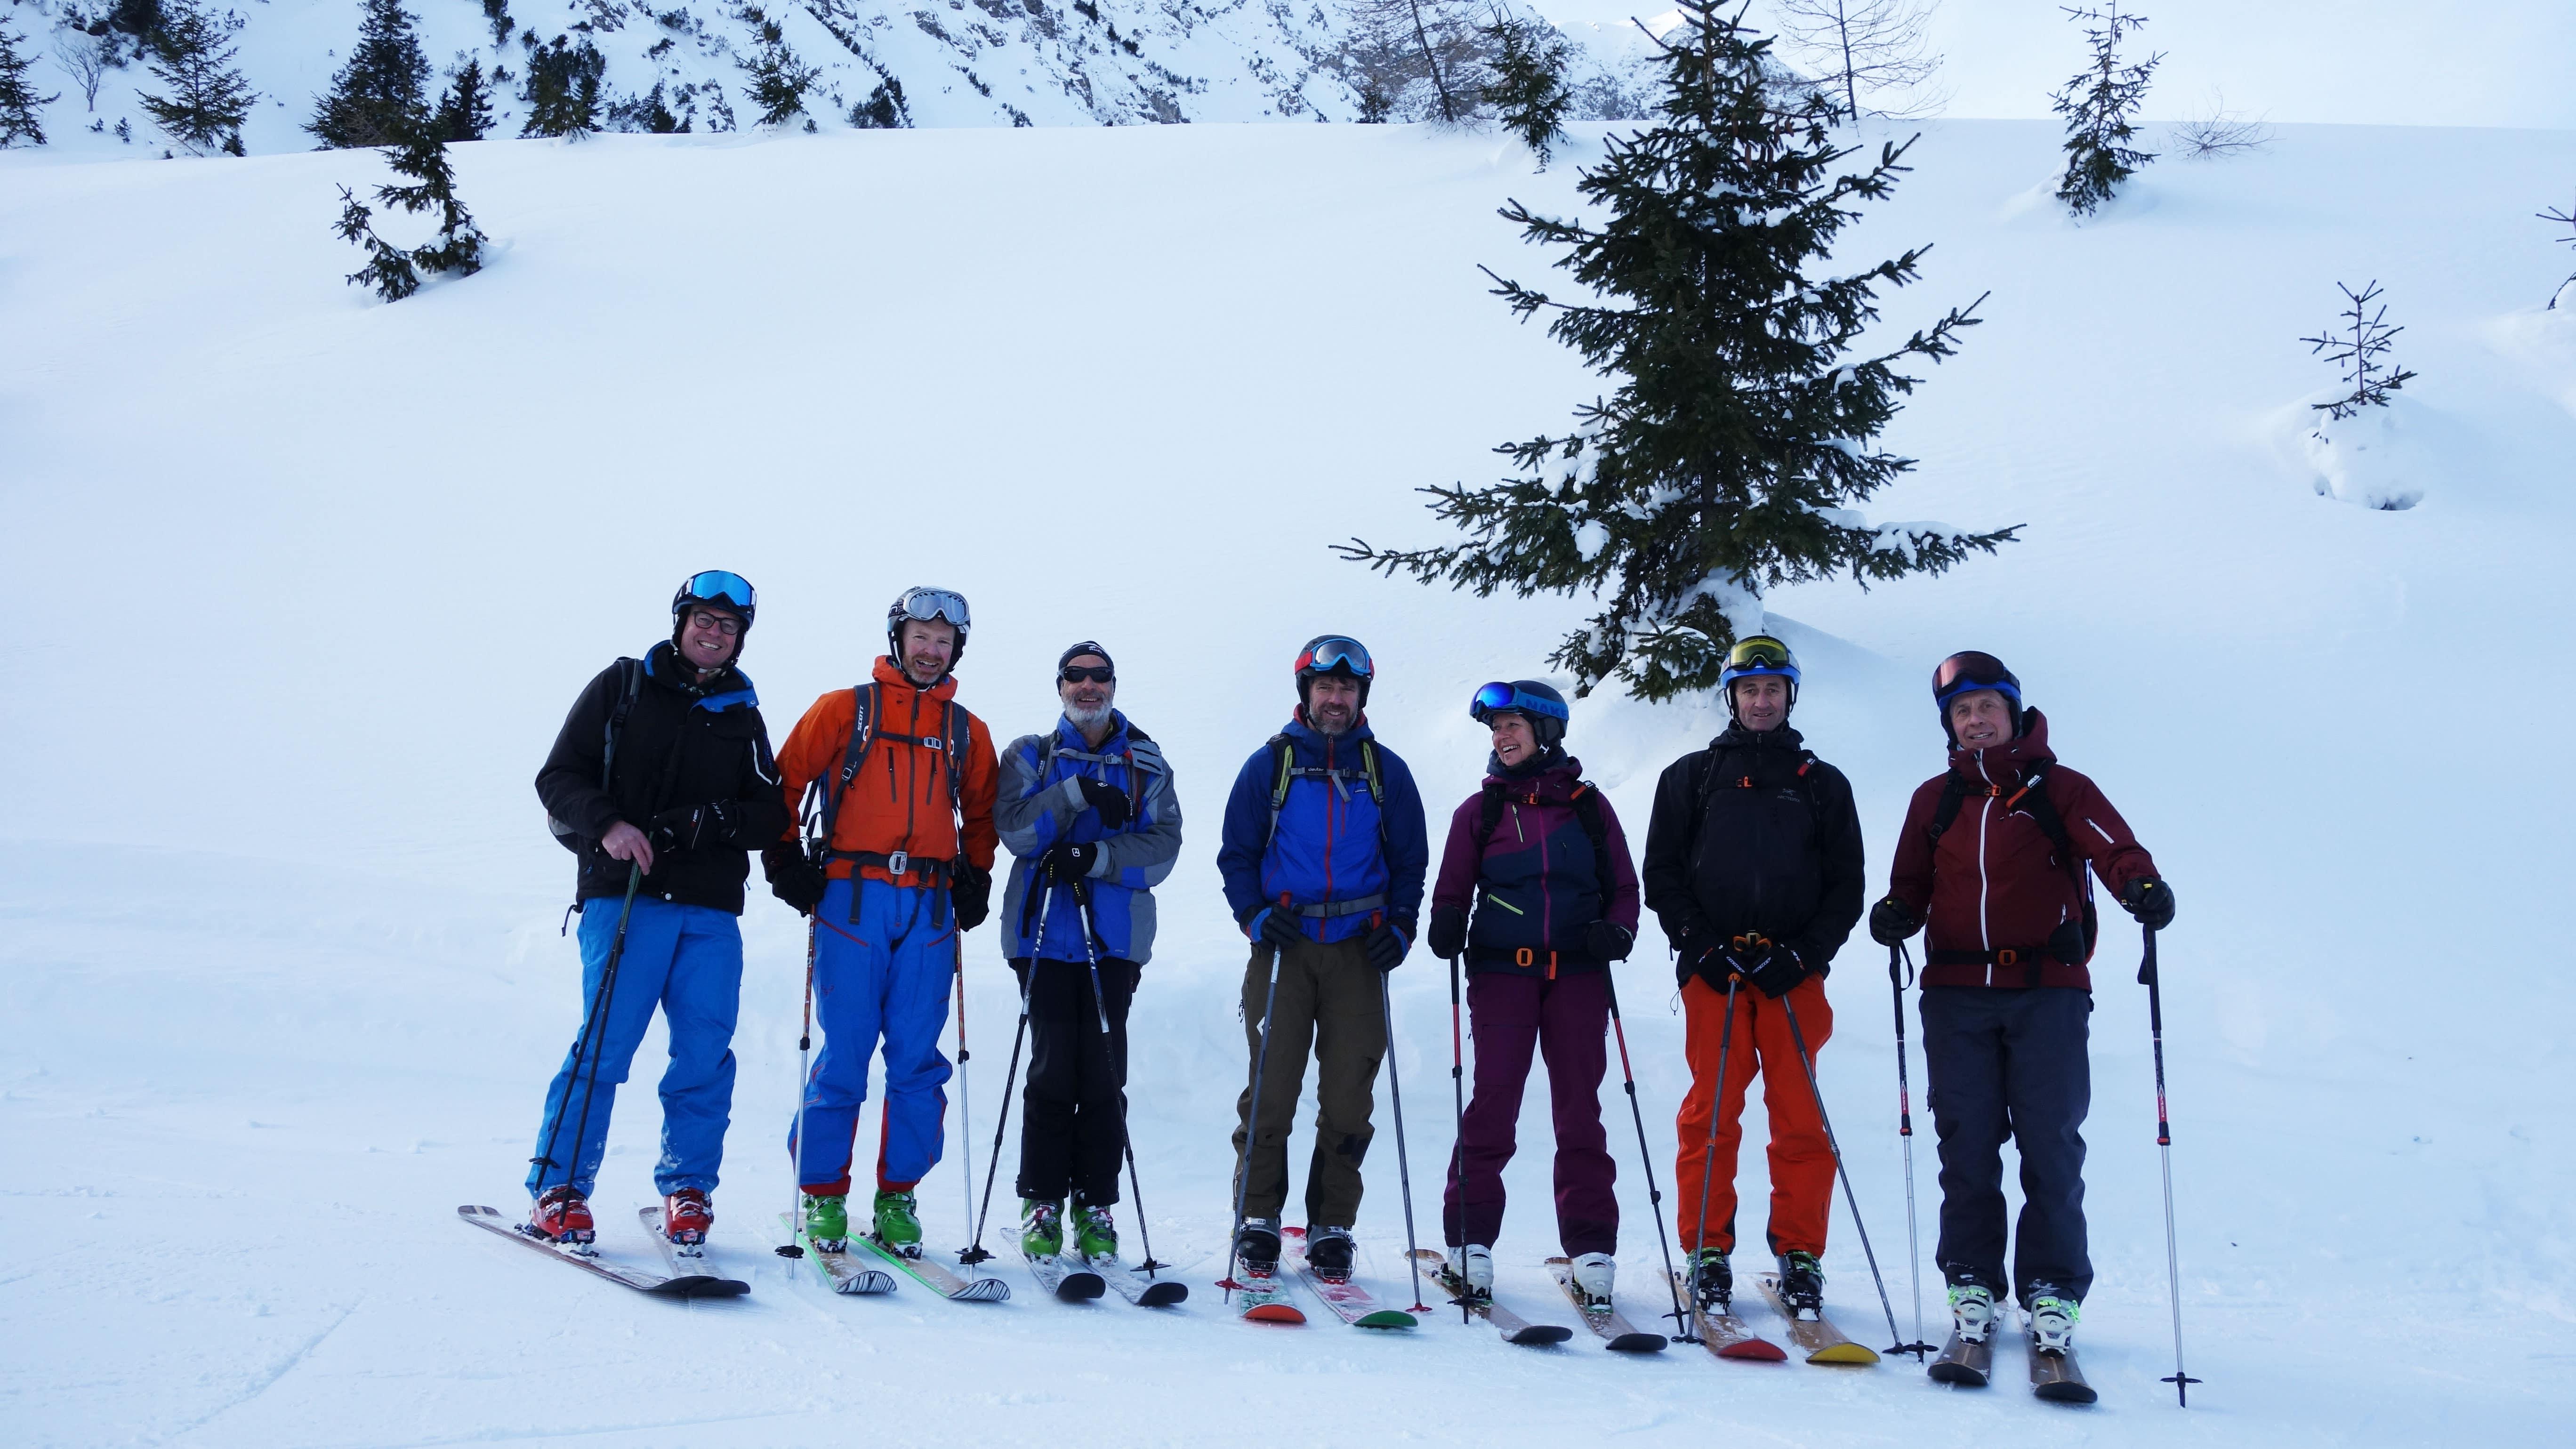 Skibauertag 2019 Nesselwängle und Tannheim.